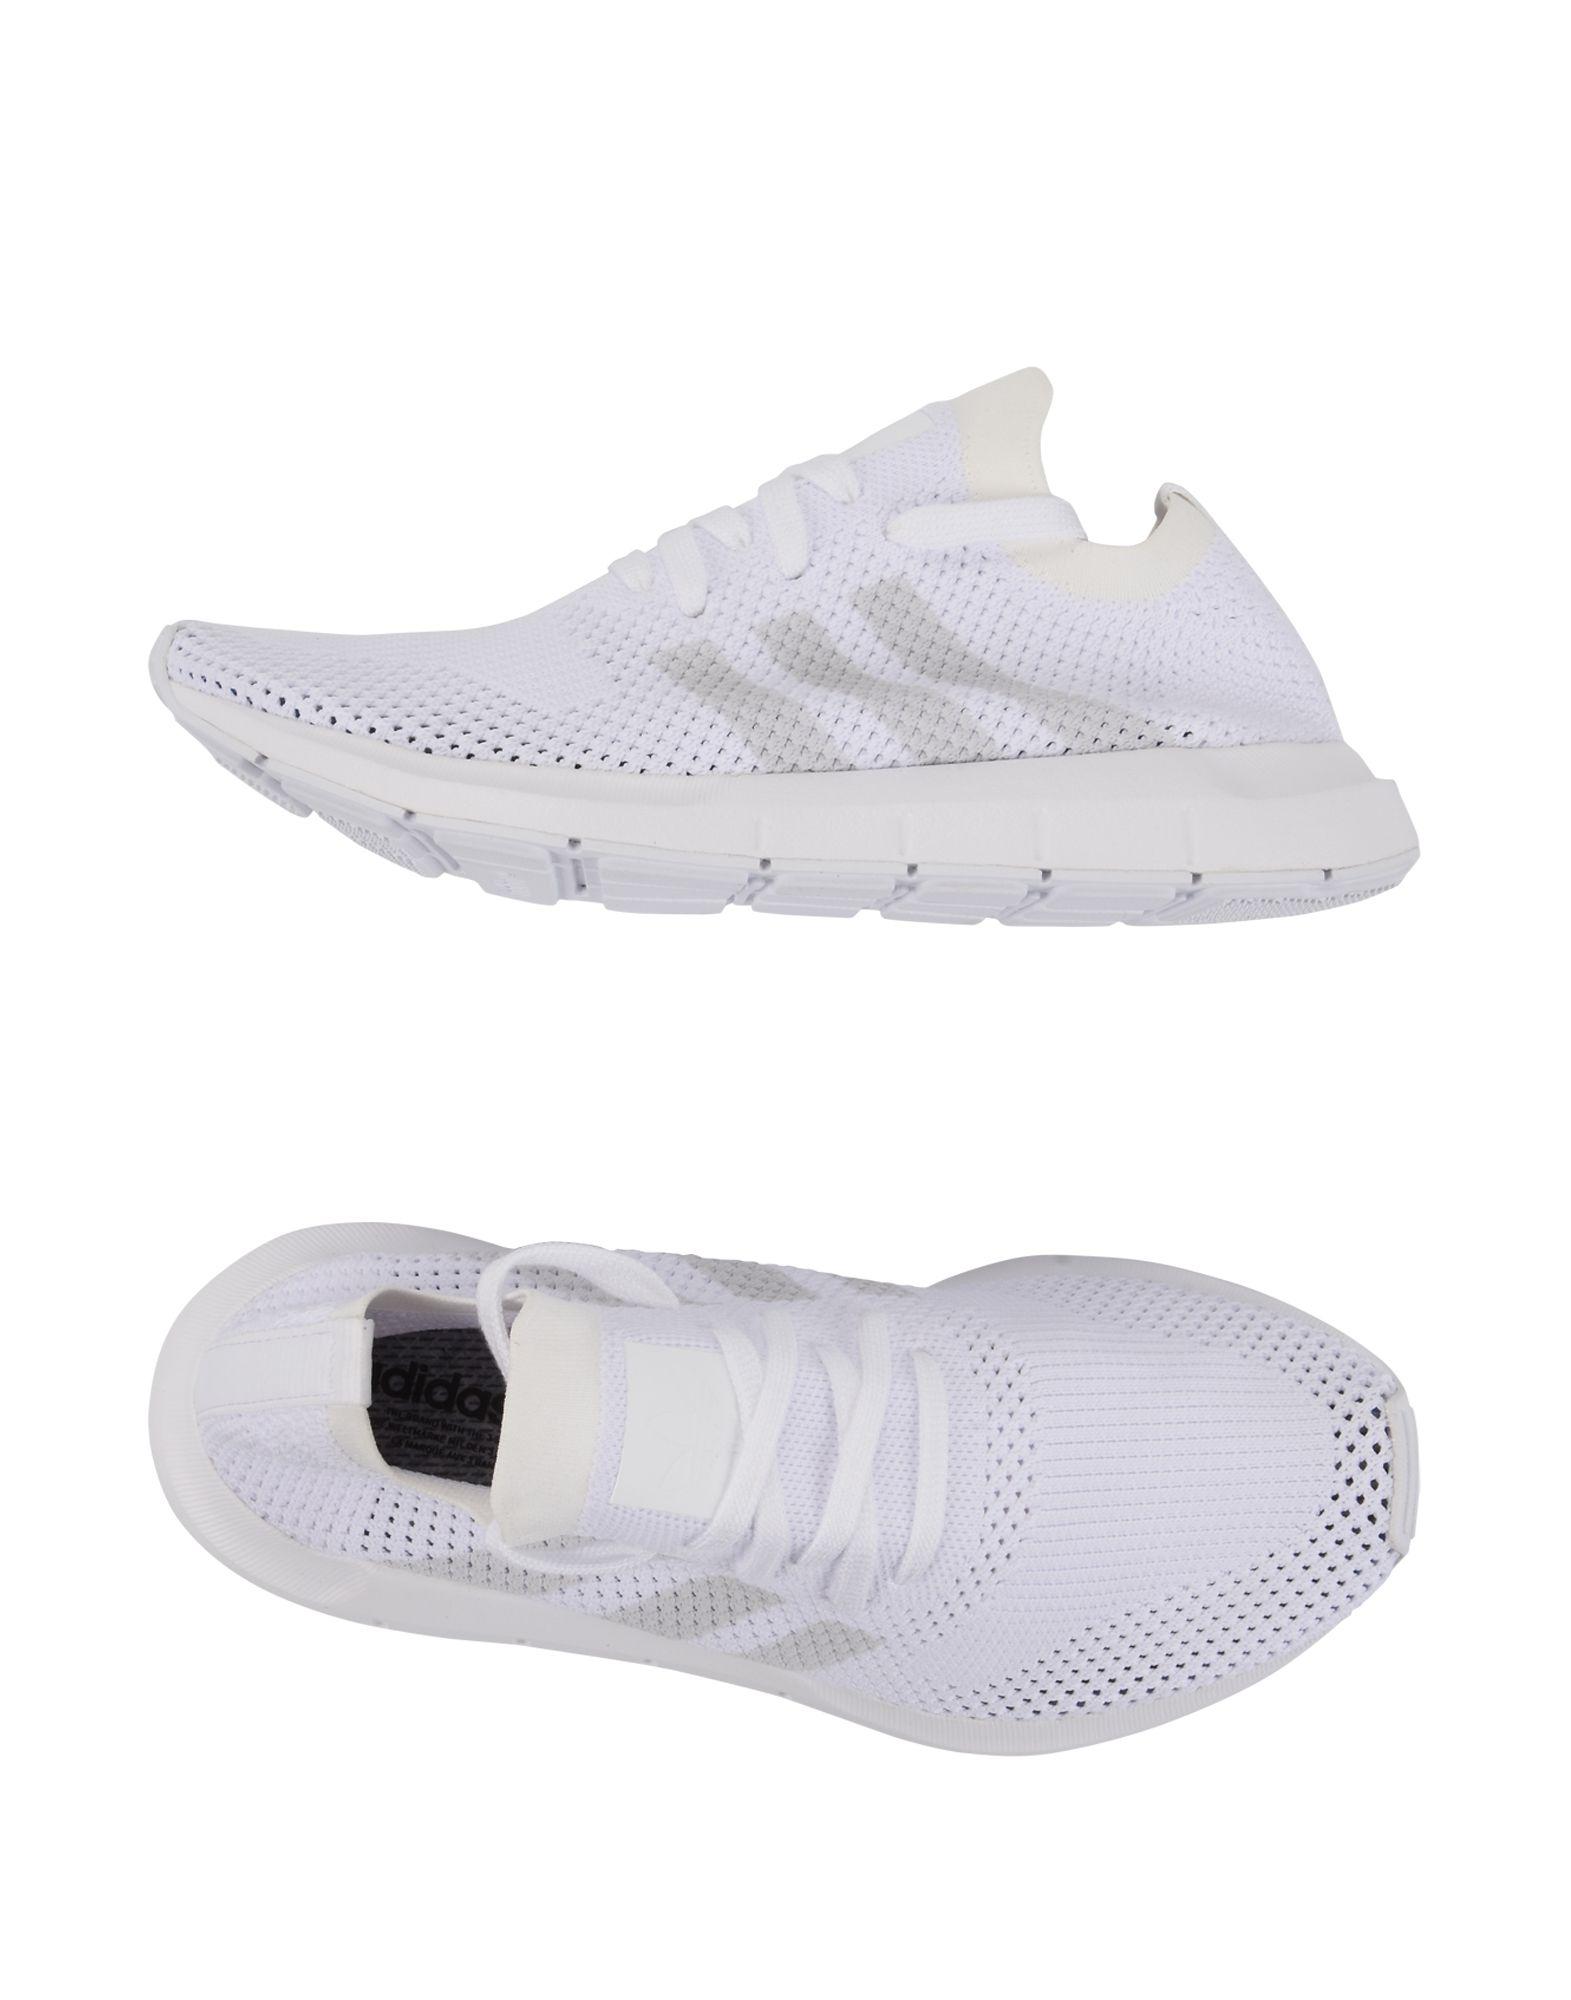 Adidas Originals Swift Run Pk - Sneakers - online Women Adidas Originals Sneakers online - on  United Kingdom - 11415324PL b1c45f